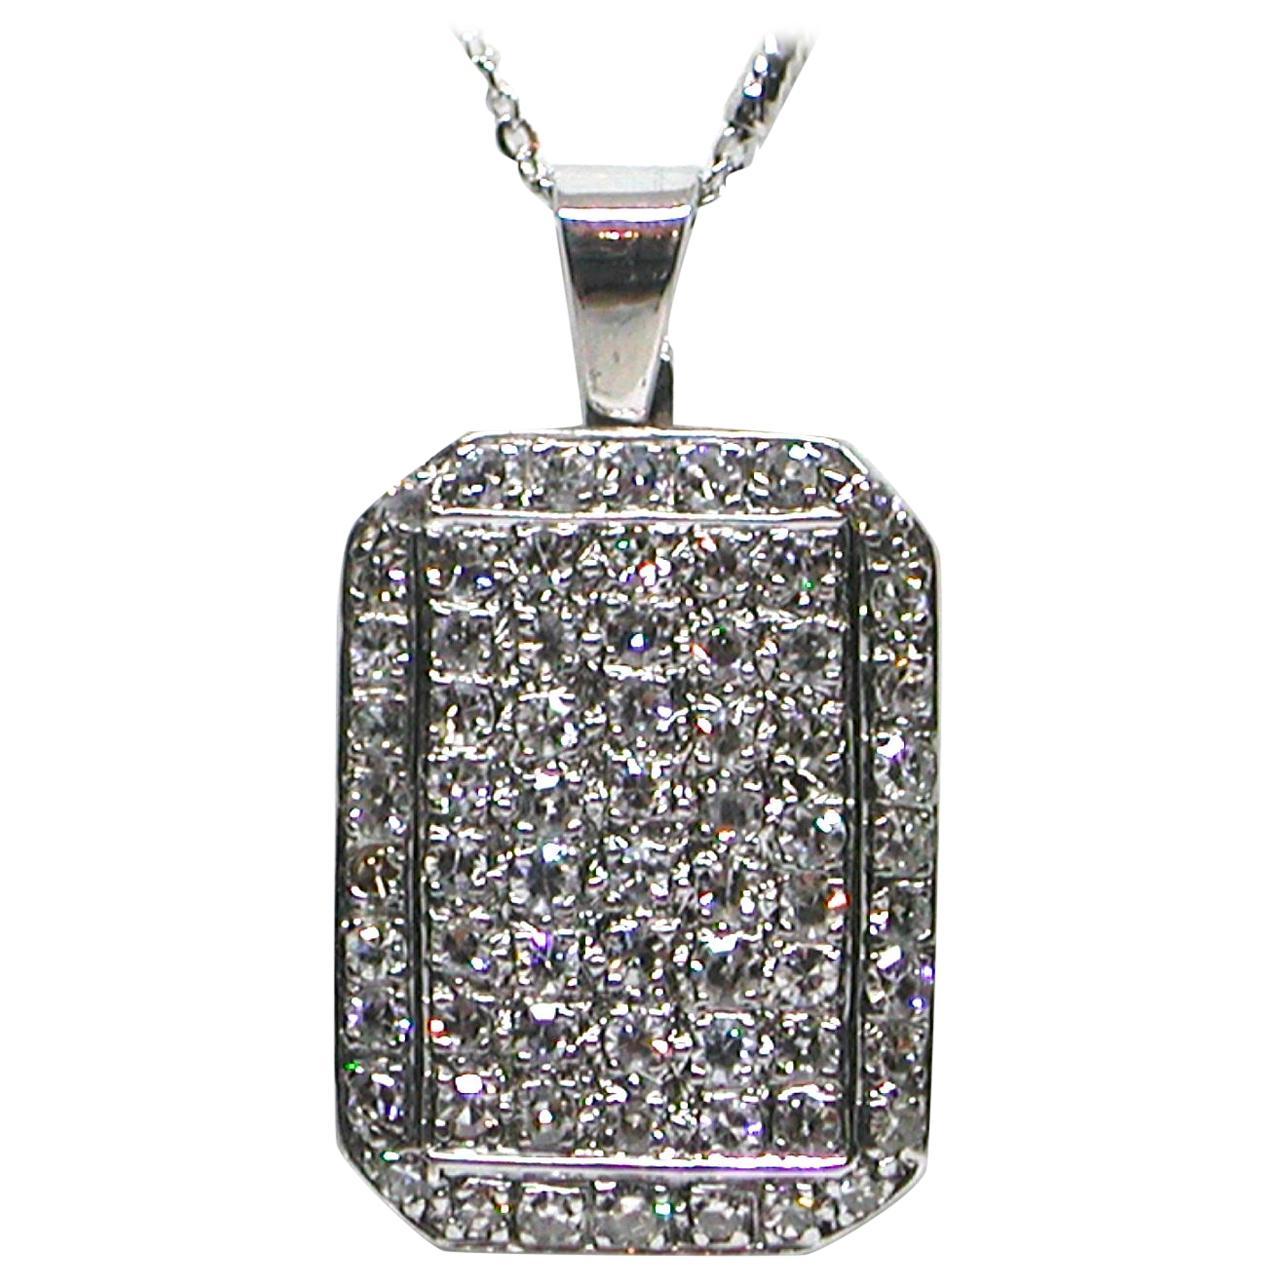 3.10 Carat White Gold Diamond Necklace Pendant